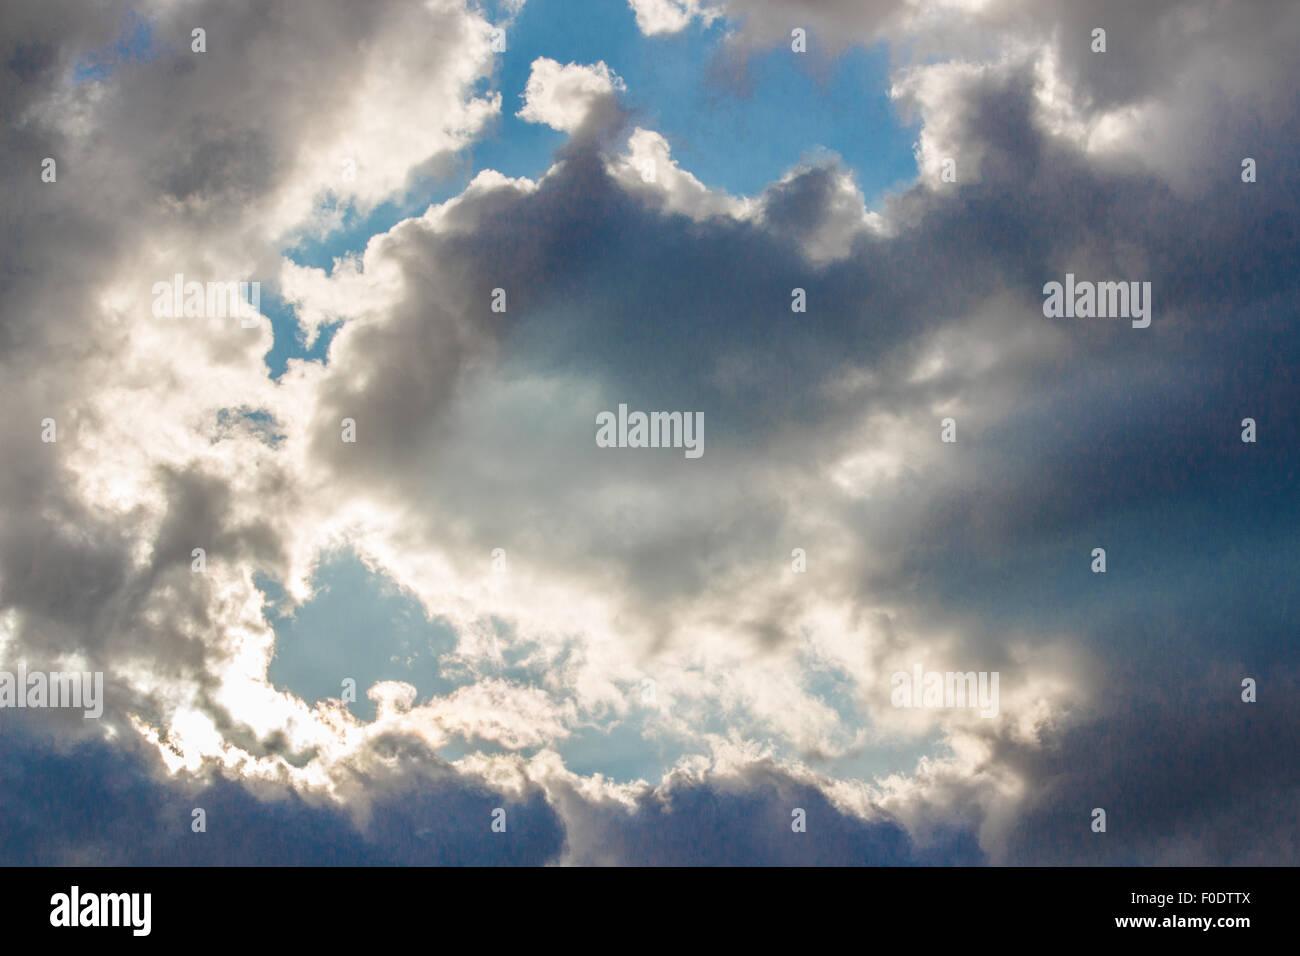 Dark clouds cover the blu sky - Stock Image